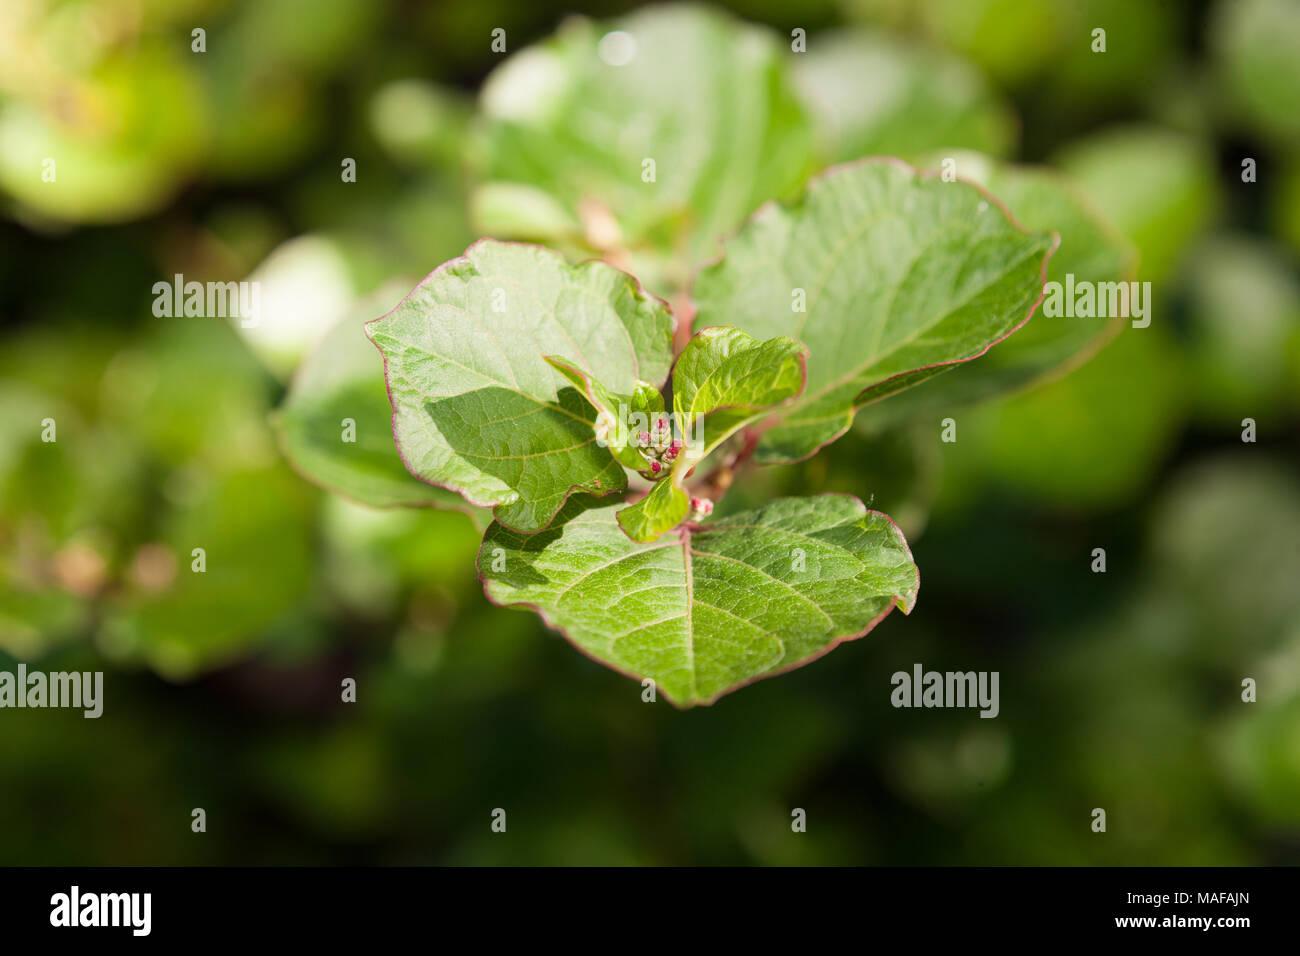 Japanese Knotweed, Parkslide (Fallopia japonica) - Stock Image